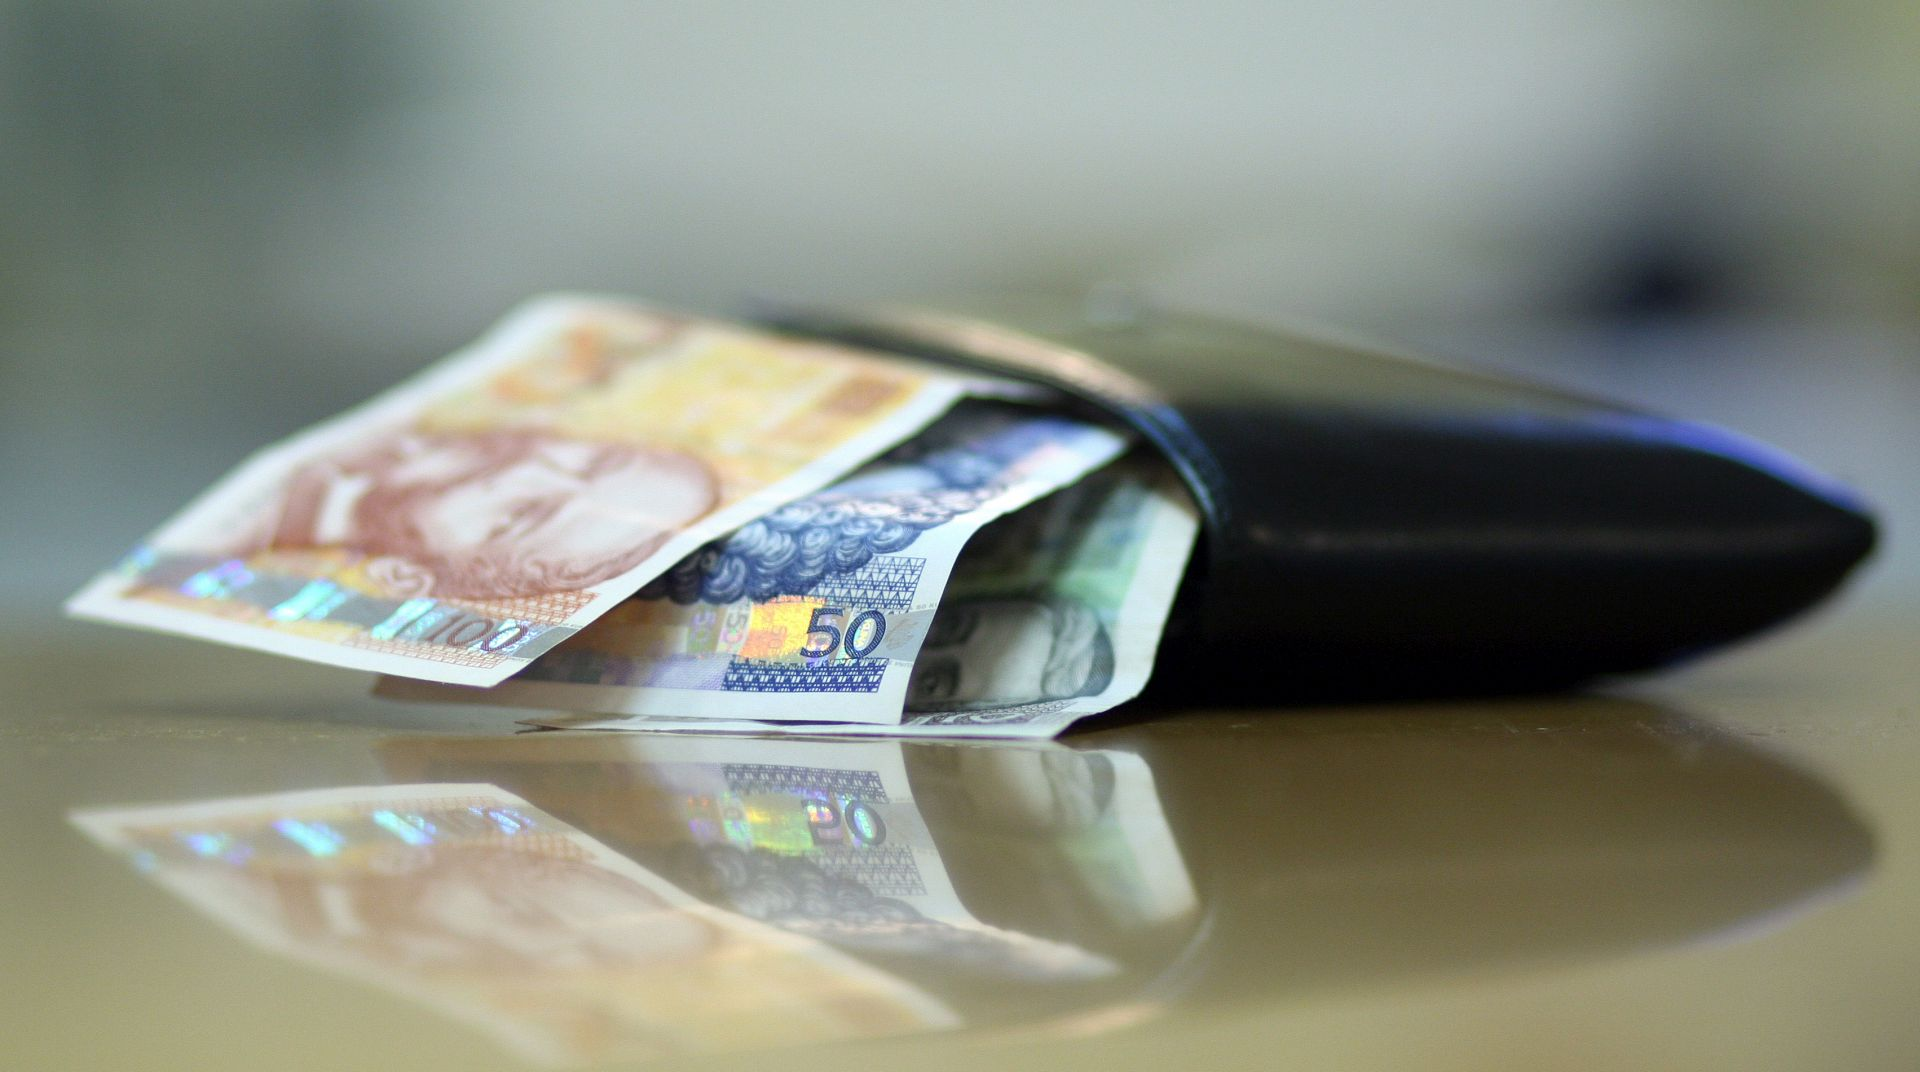 DUG/DEFICIT: Hrvatska lani ostvarila deficit od 0,9 posto BDP-a, pao i javni dug